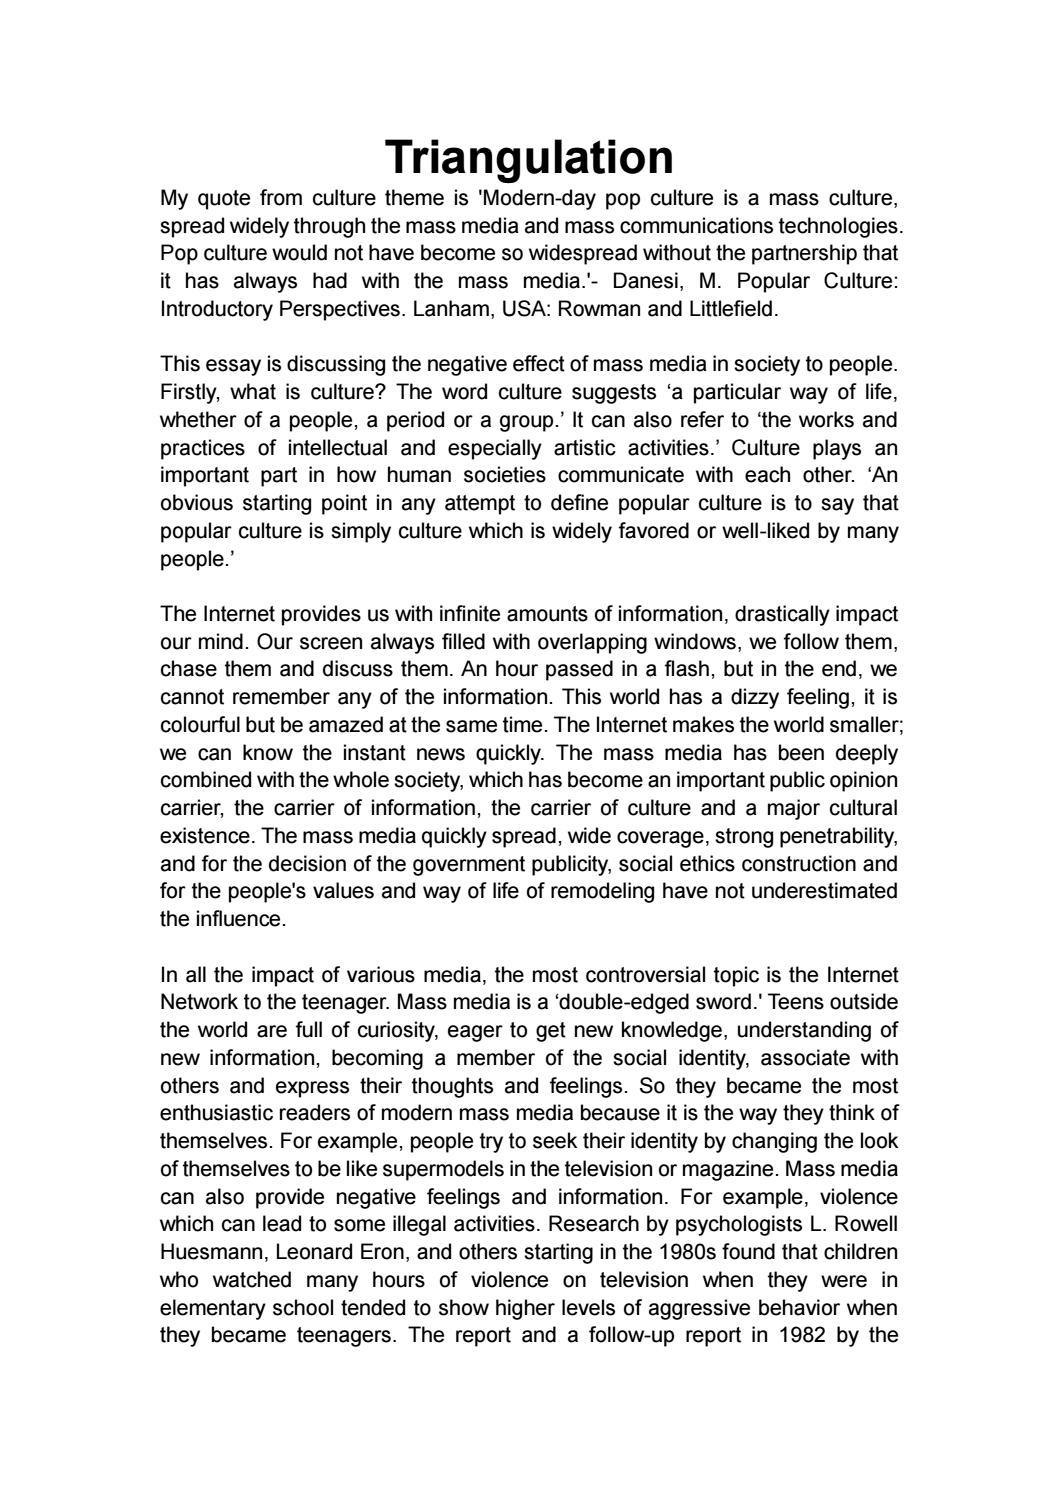 Consumer services essay report paper format